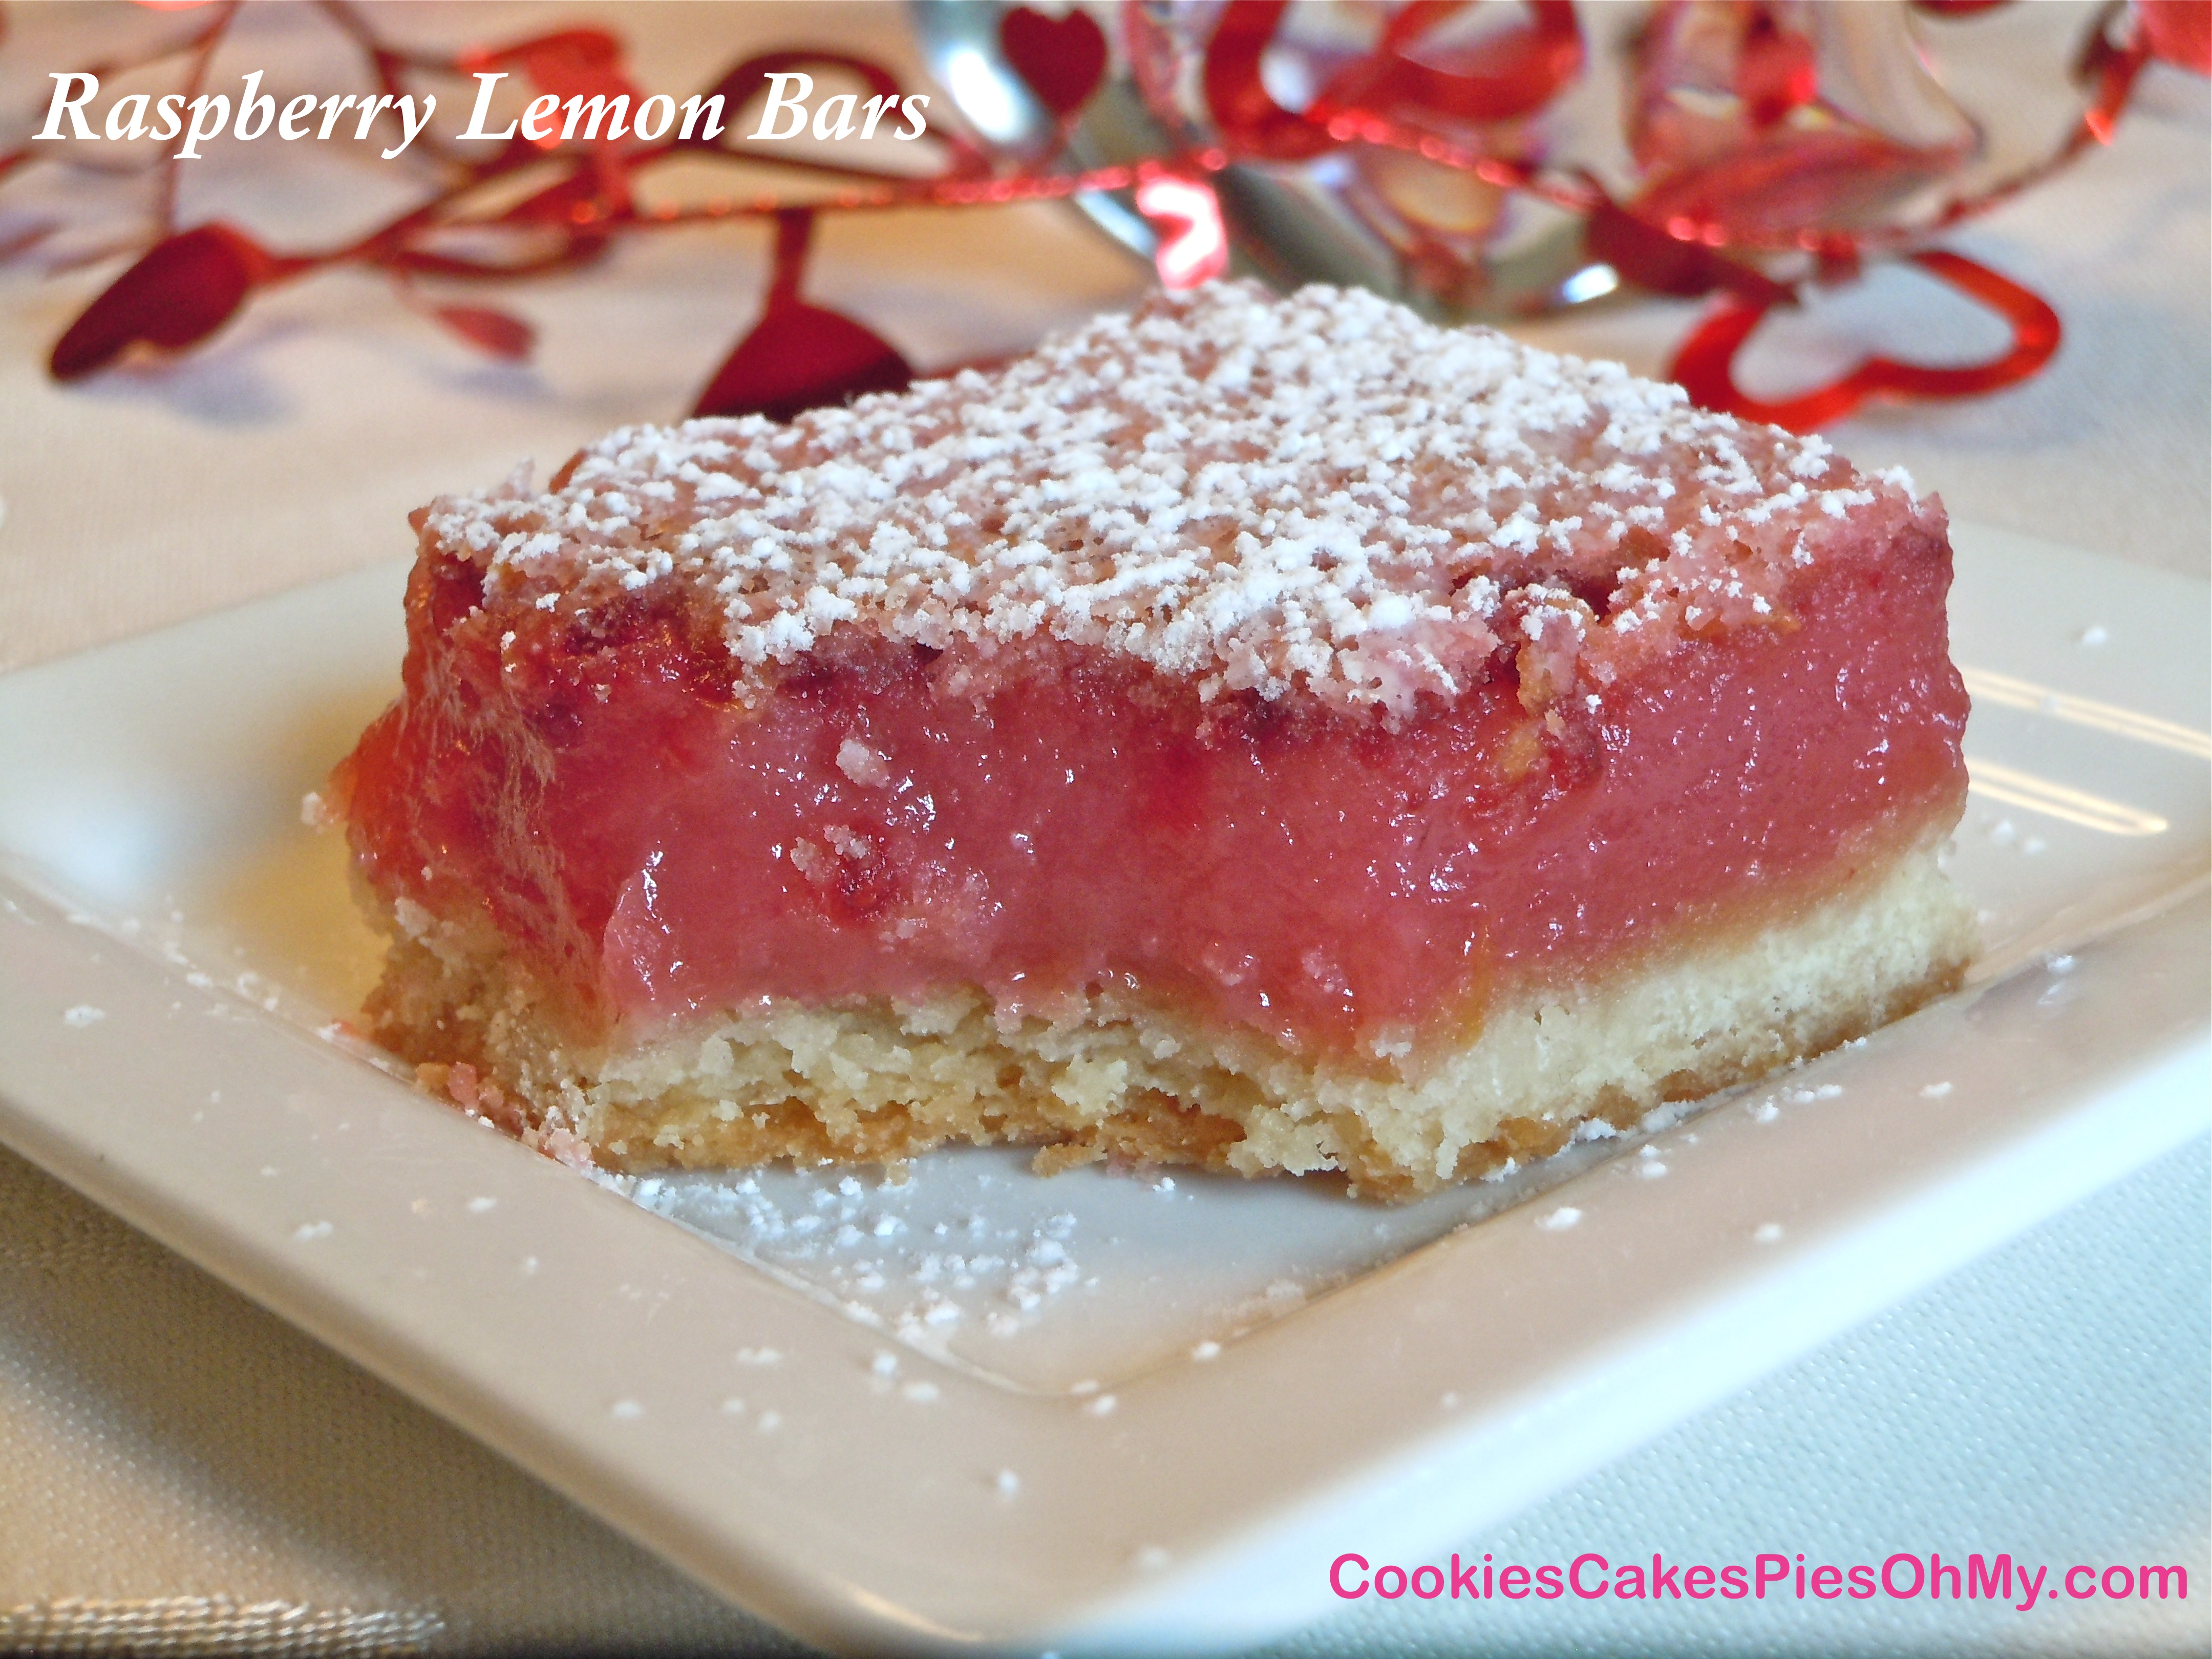 Raspberry Lemon Bars | CookiesCakesPiesOhMy